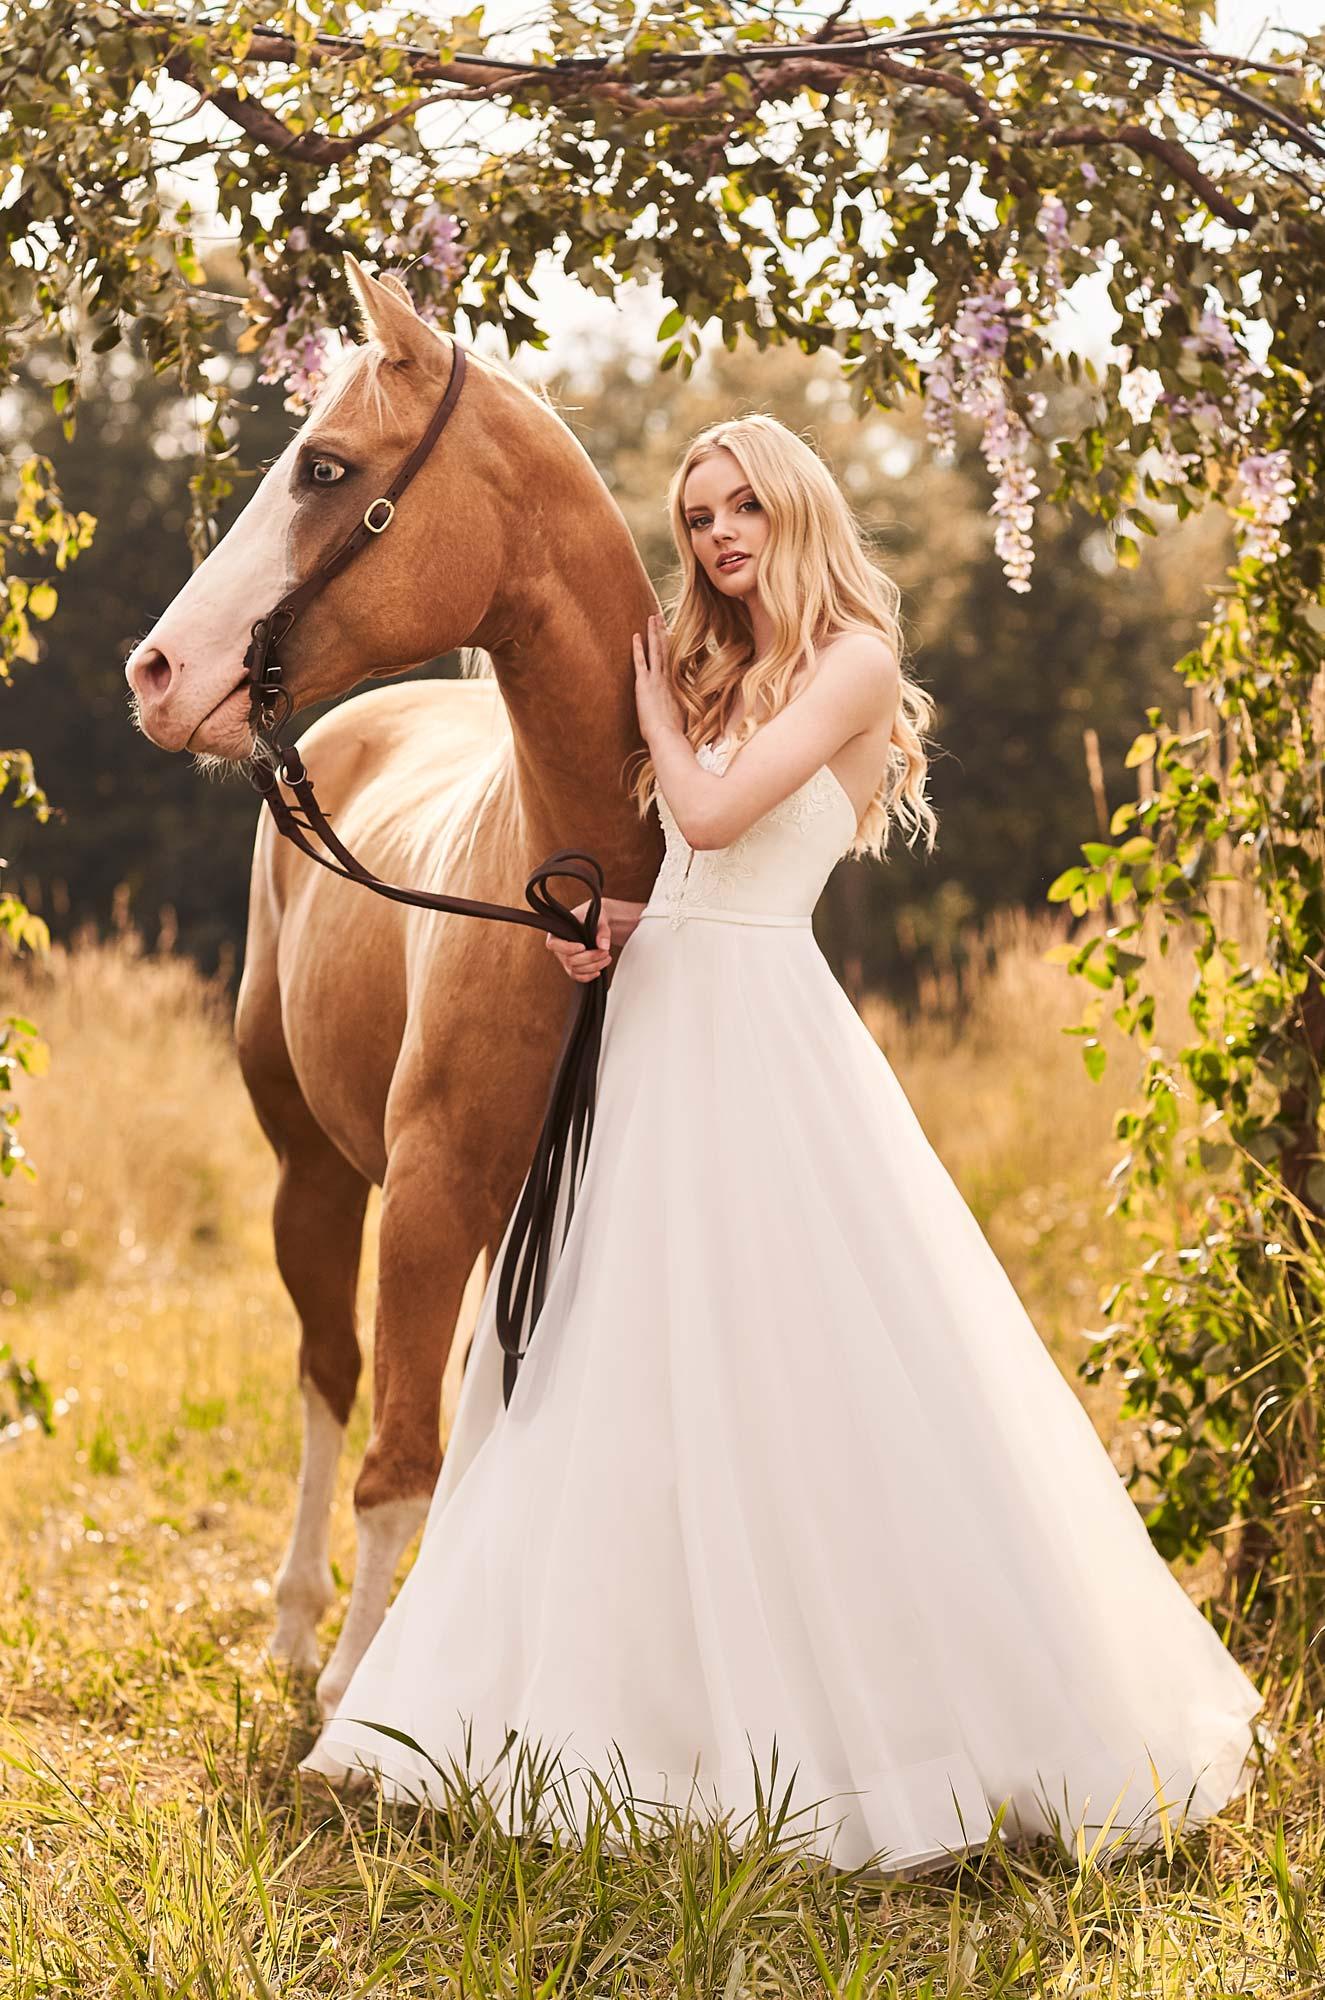 Beaded Strapless Wedding Dress – Style #2291 | Mikaella Bridal